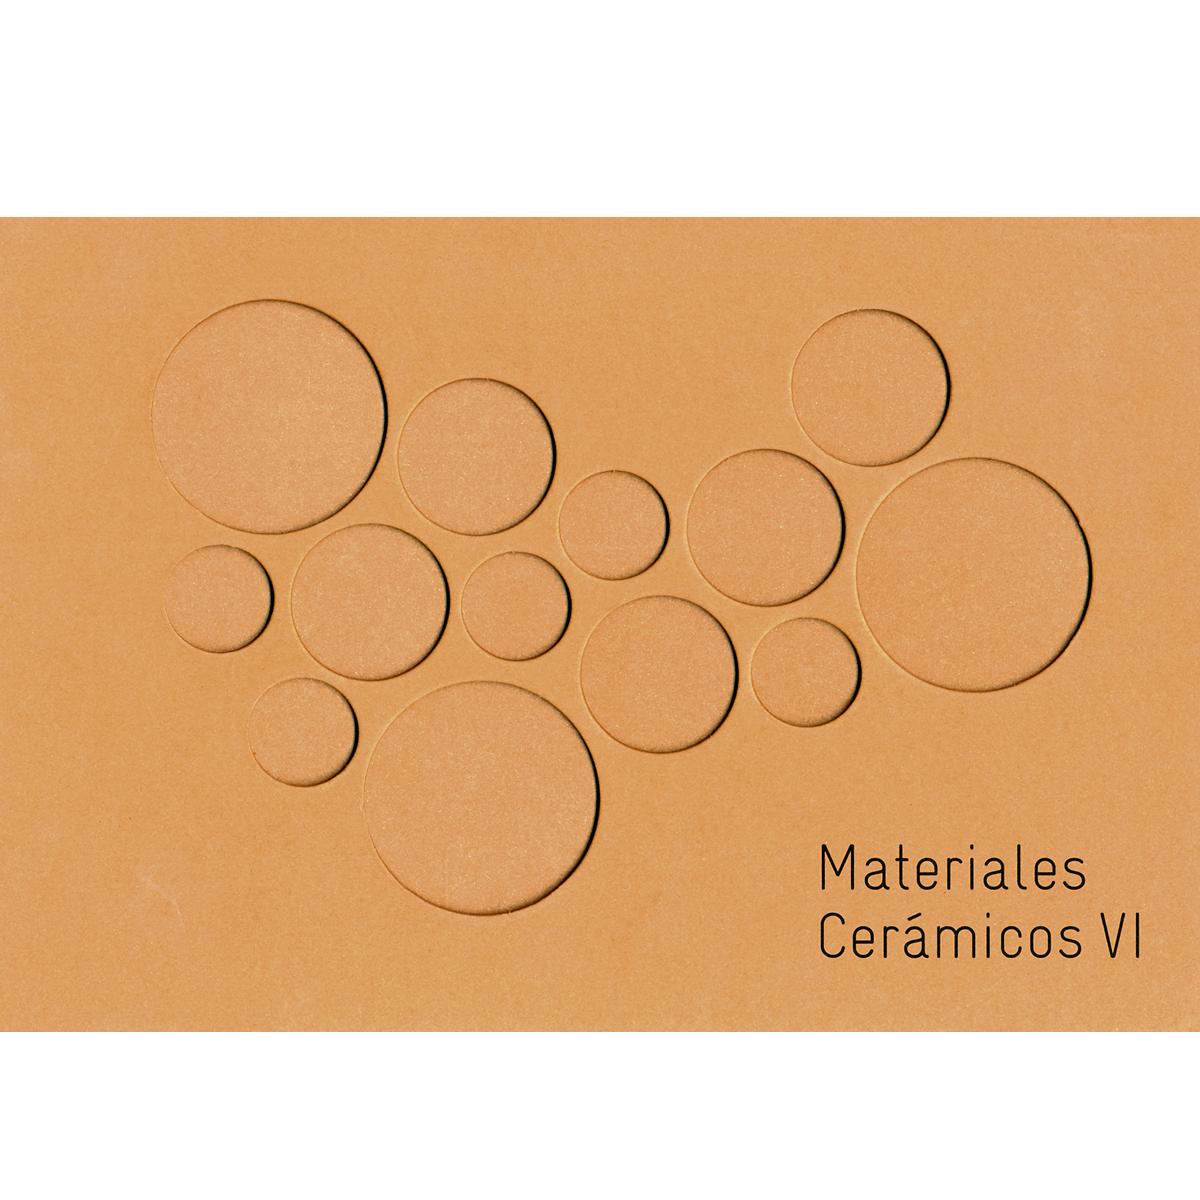 Materiales Cerámicos VI